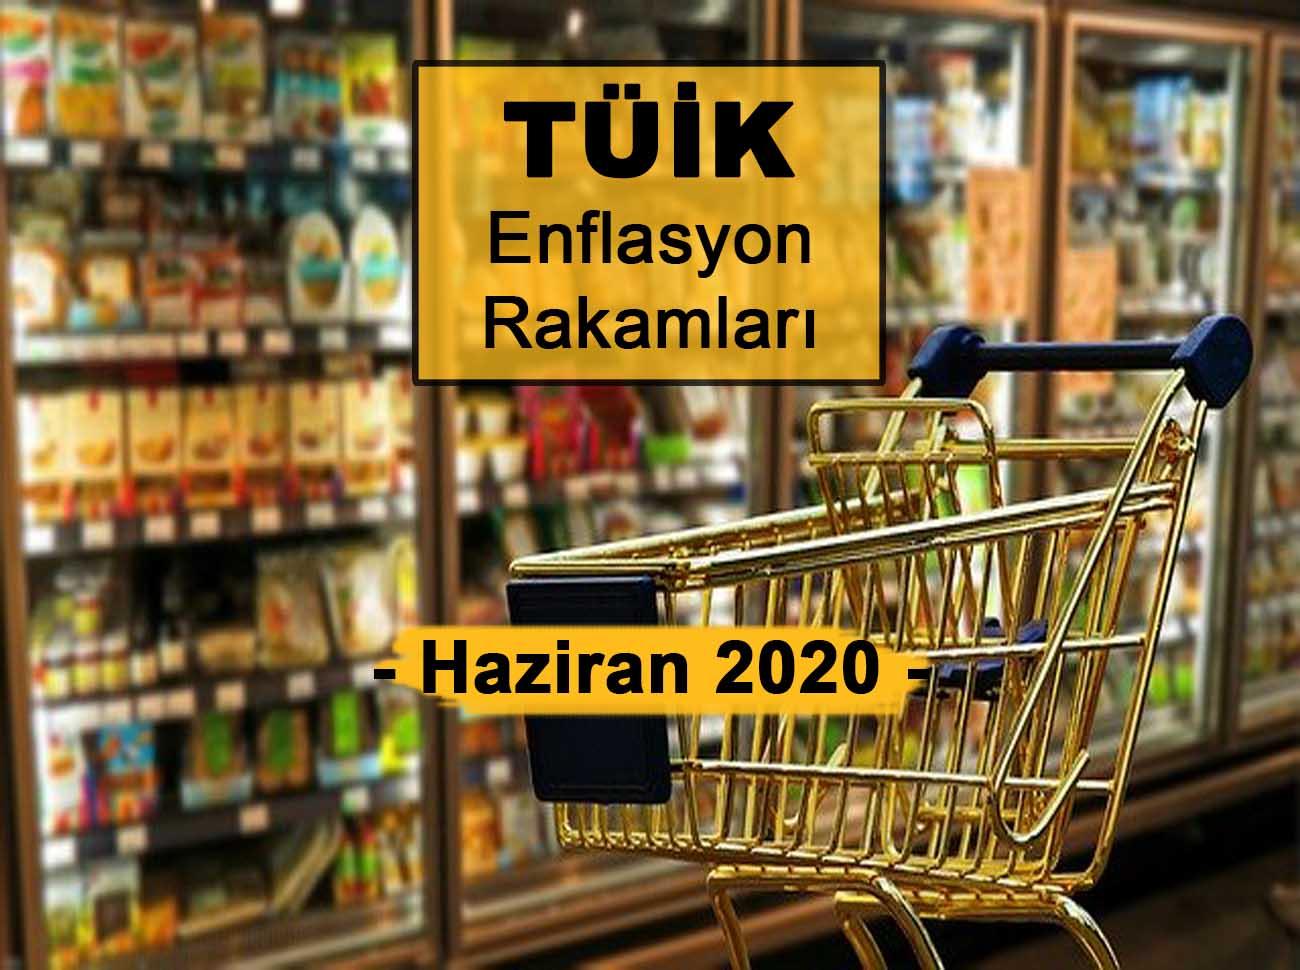 Enflasyon Rakamları (Haziran 2020)